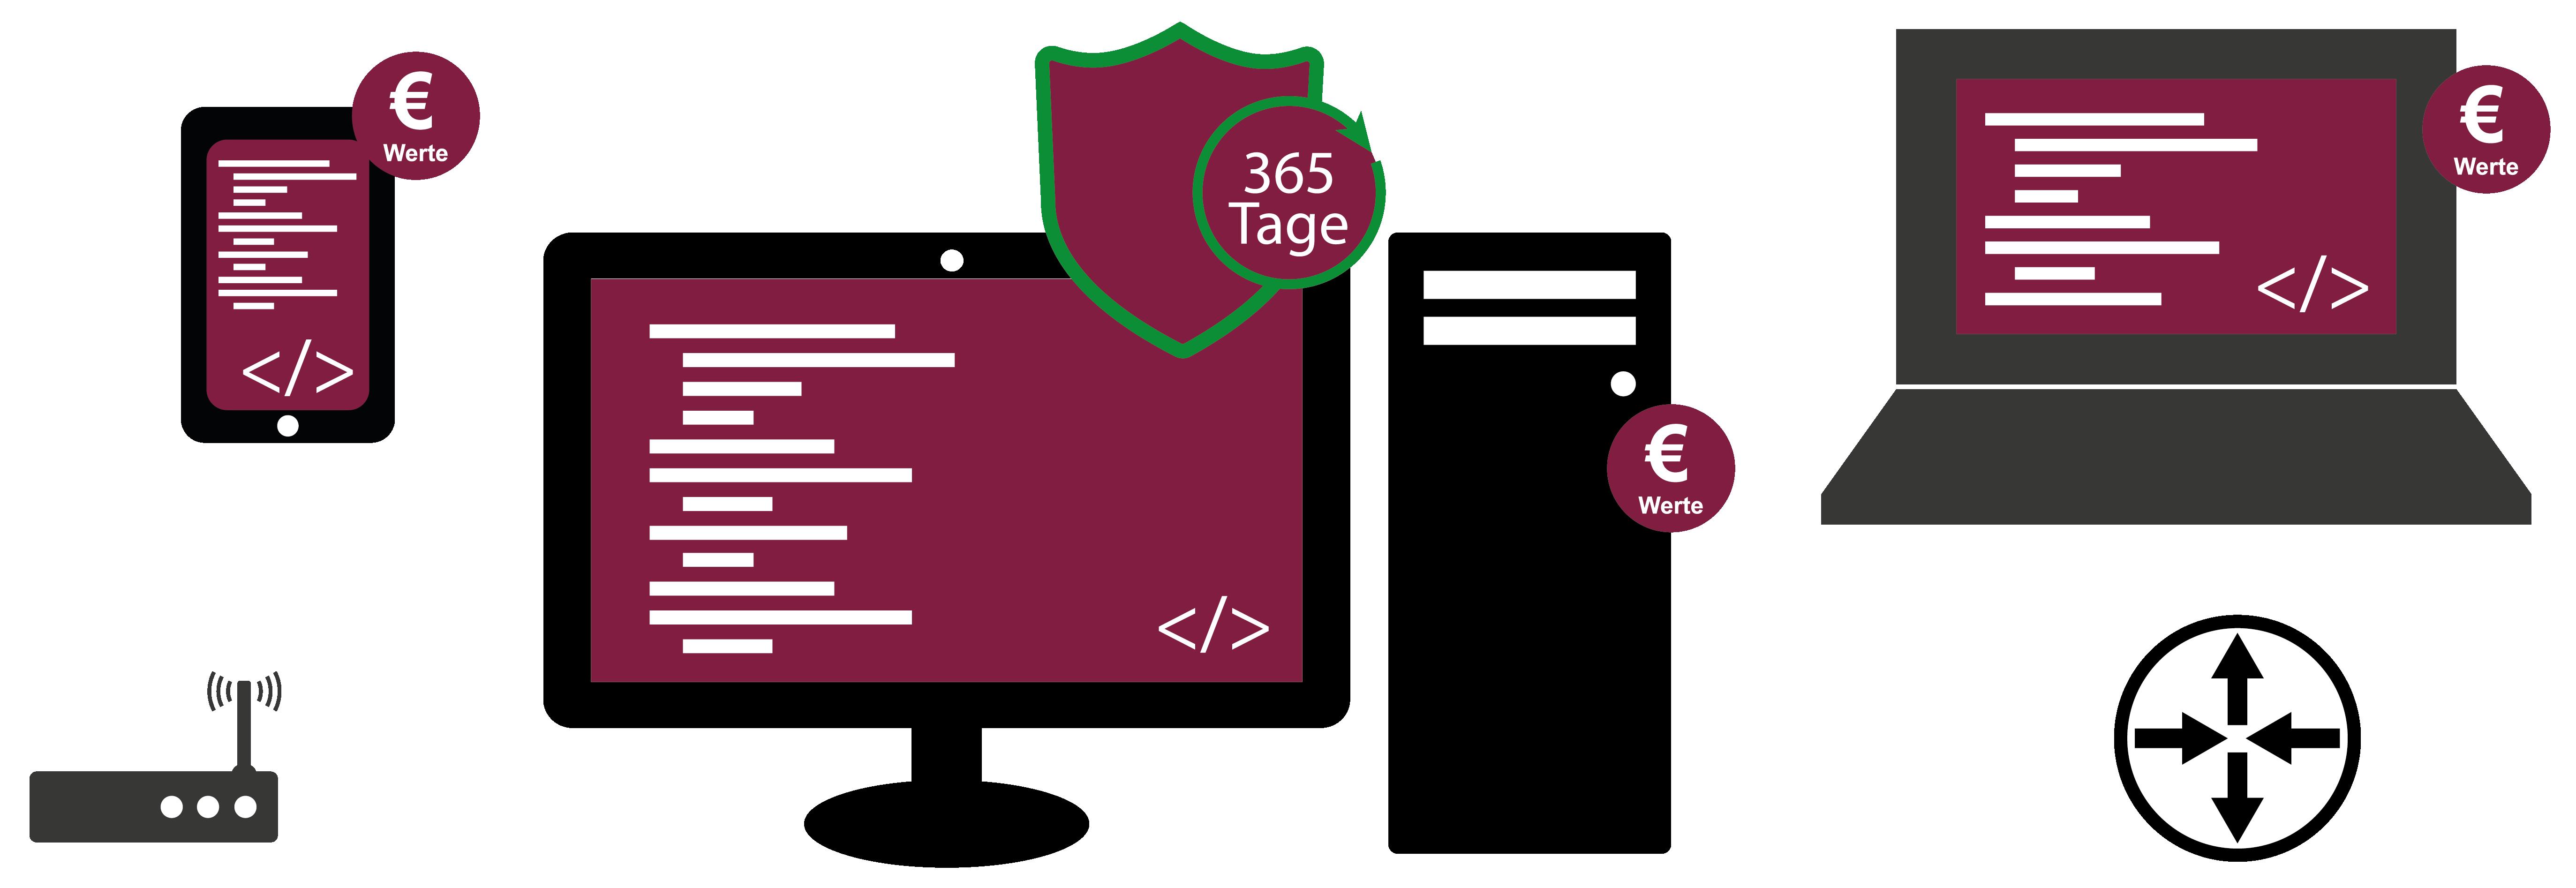 IT-Sicherheit – Glossar Cyber-Sicherheit – Prof. Norbert Pohlmann